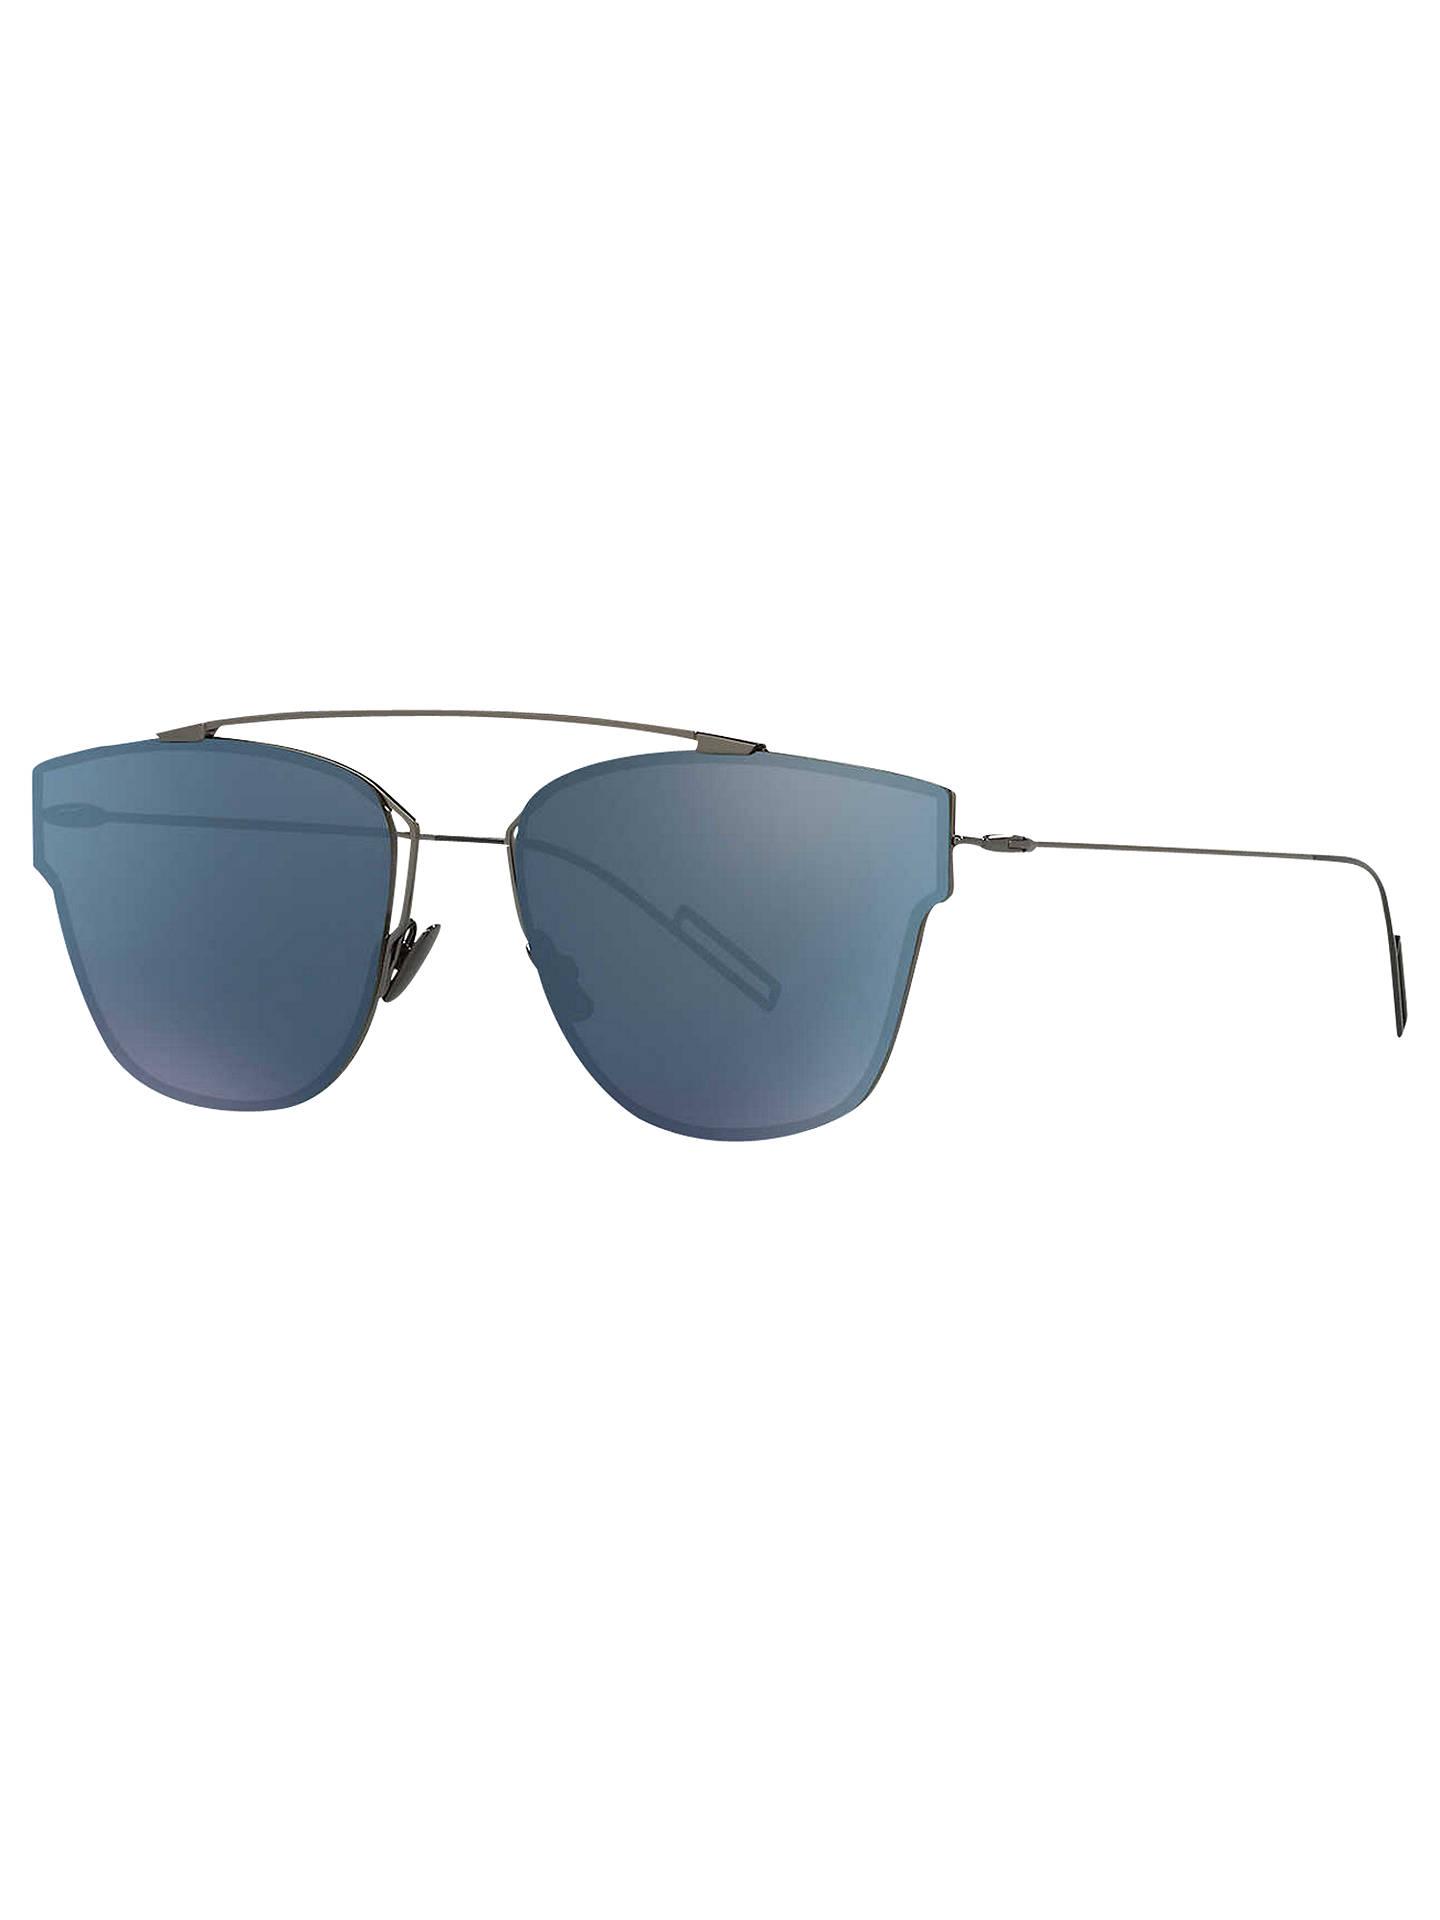 6790a9656c57 Dior DIOR0204S Aviator Sunglasses at John Lewis   Partners